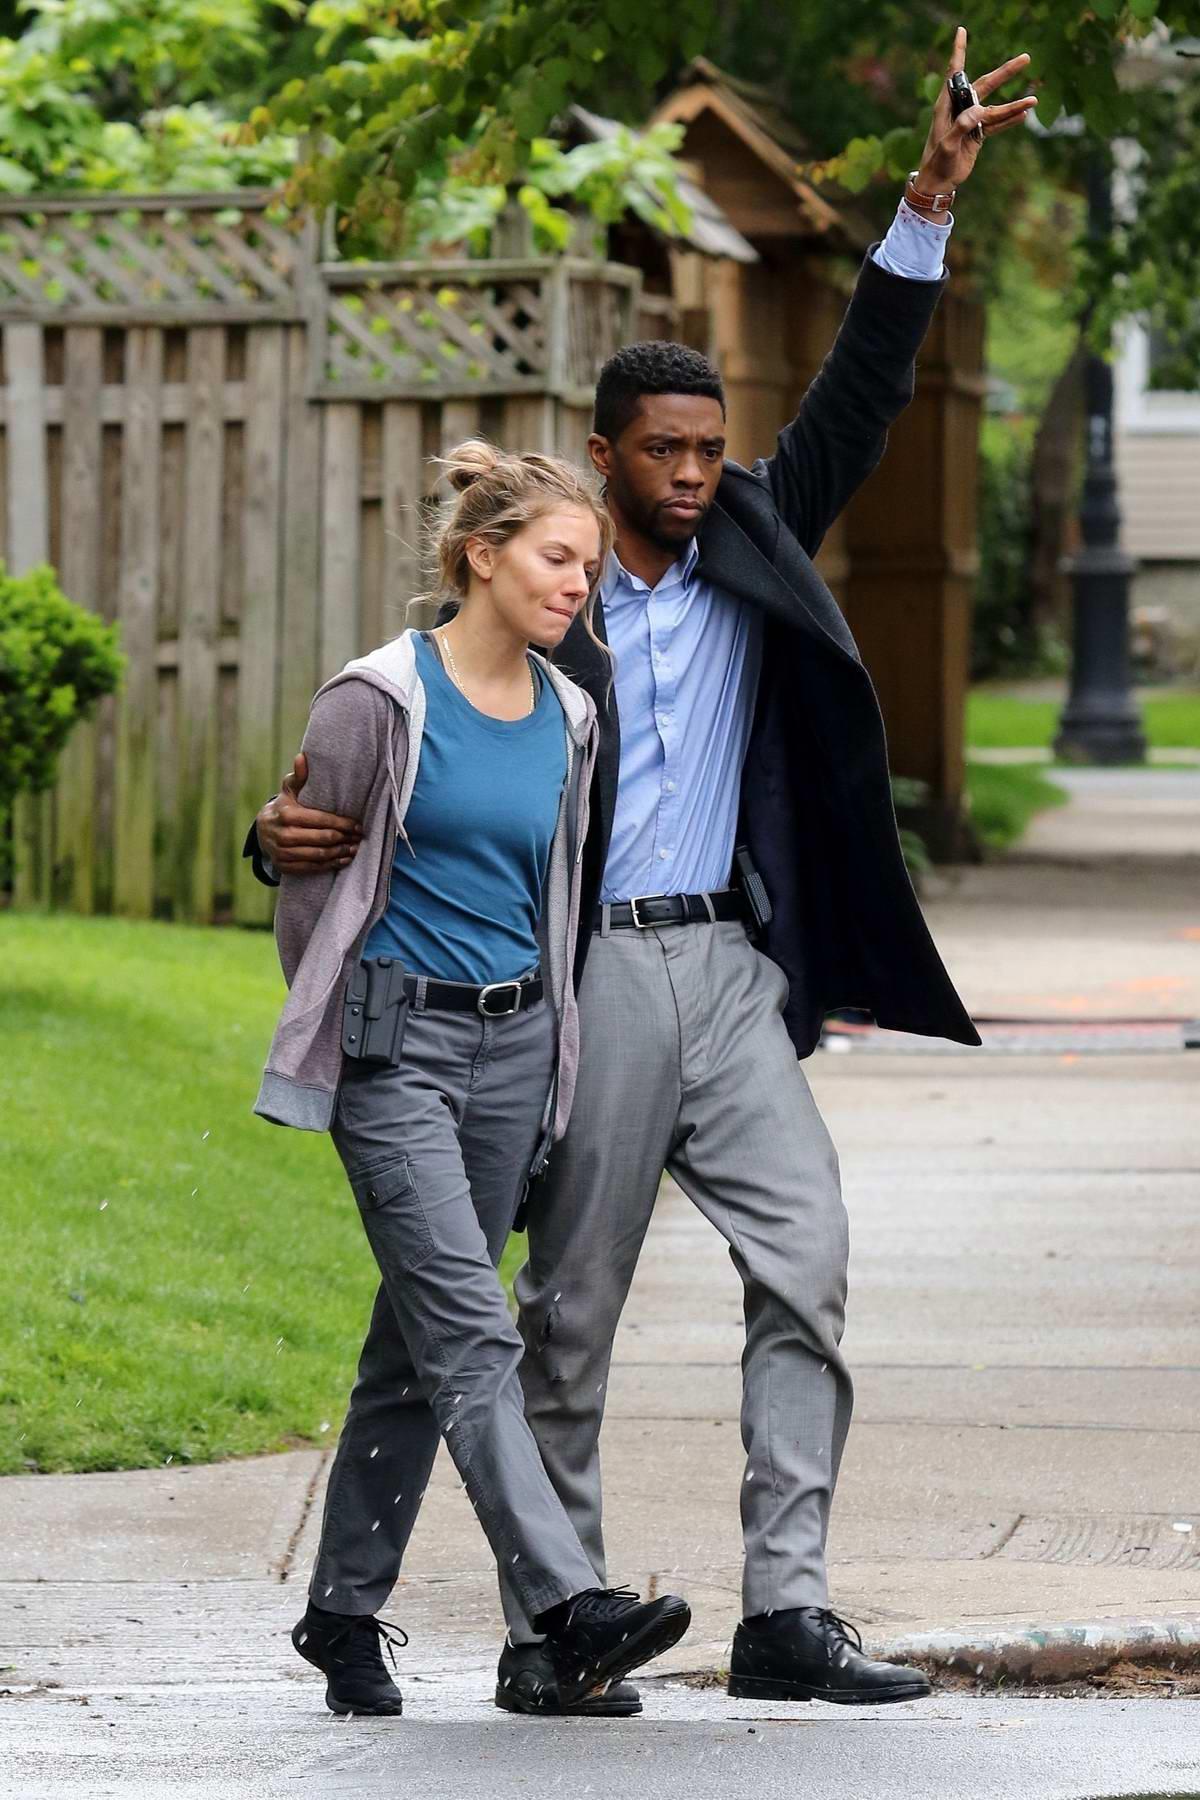 21 Bridges 3 Gavels 45 Rotten Tomatoes The Movie Judge